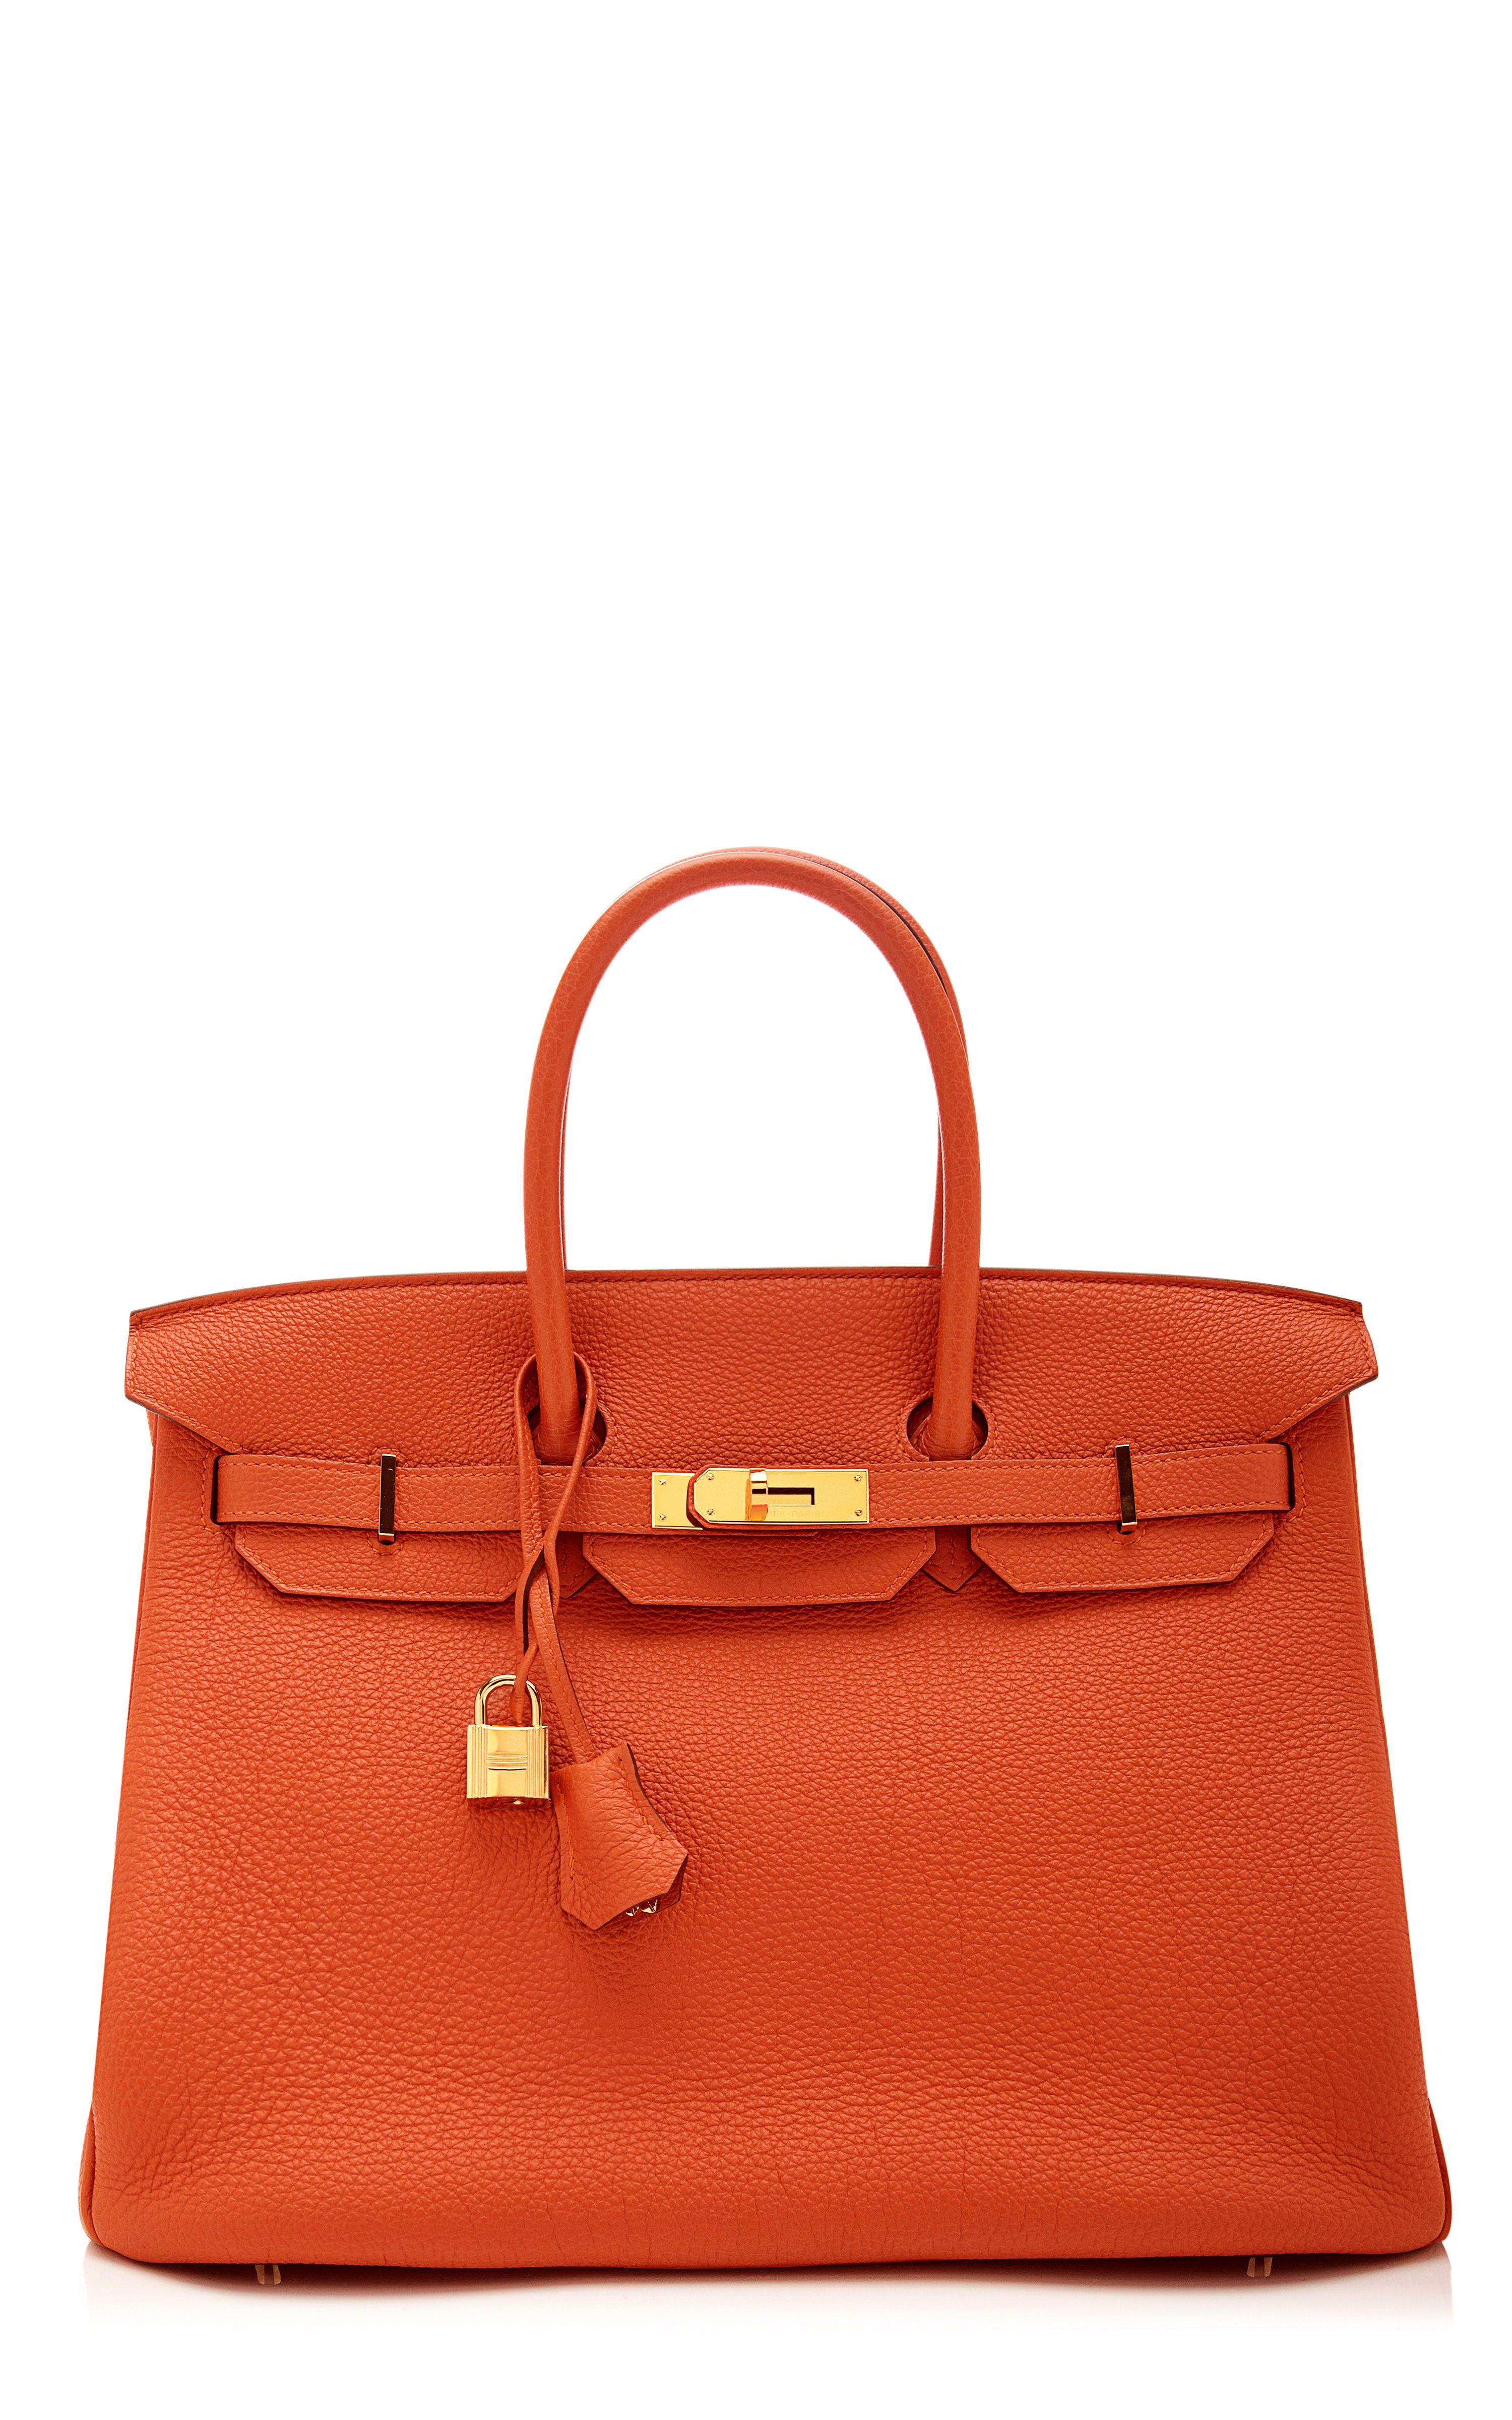 1f2b473b7903 Hermes Orange H Togo Leather 35 cm Birkin Bag – Spring 2014  www.MadamPaloozaEmporium.com www.facebook.com MadamPalooza